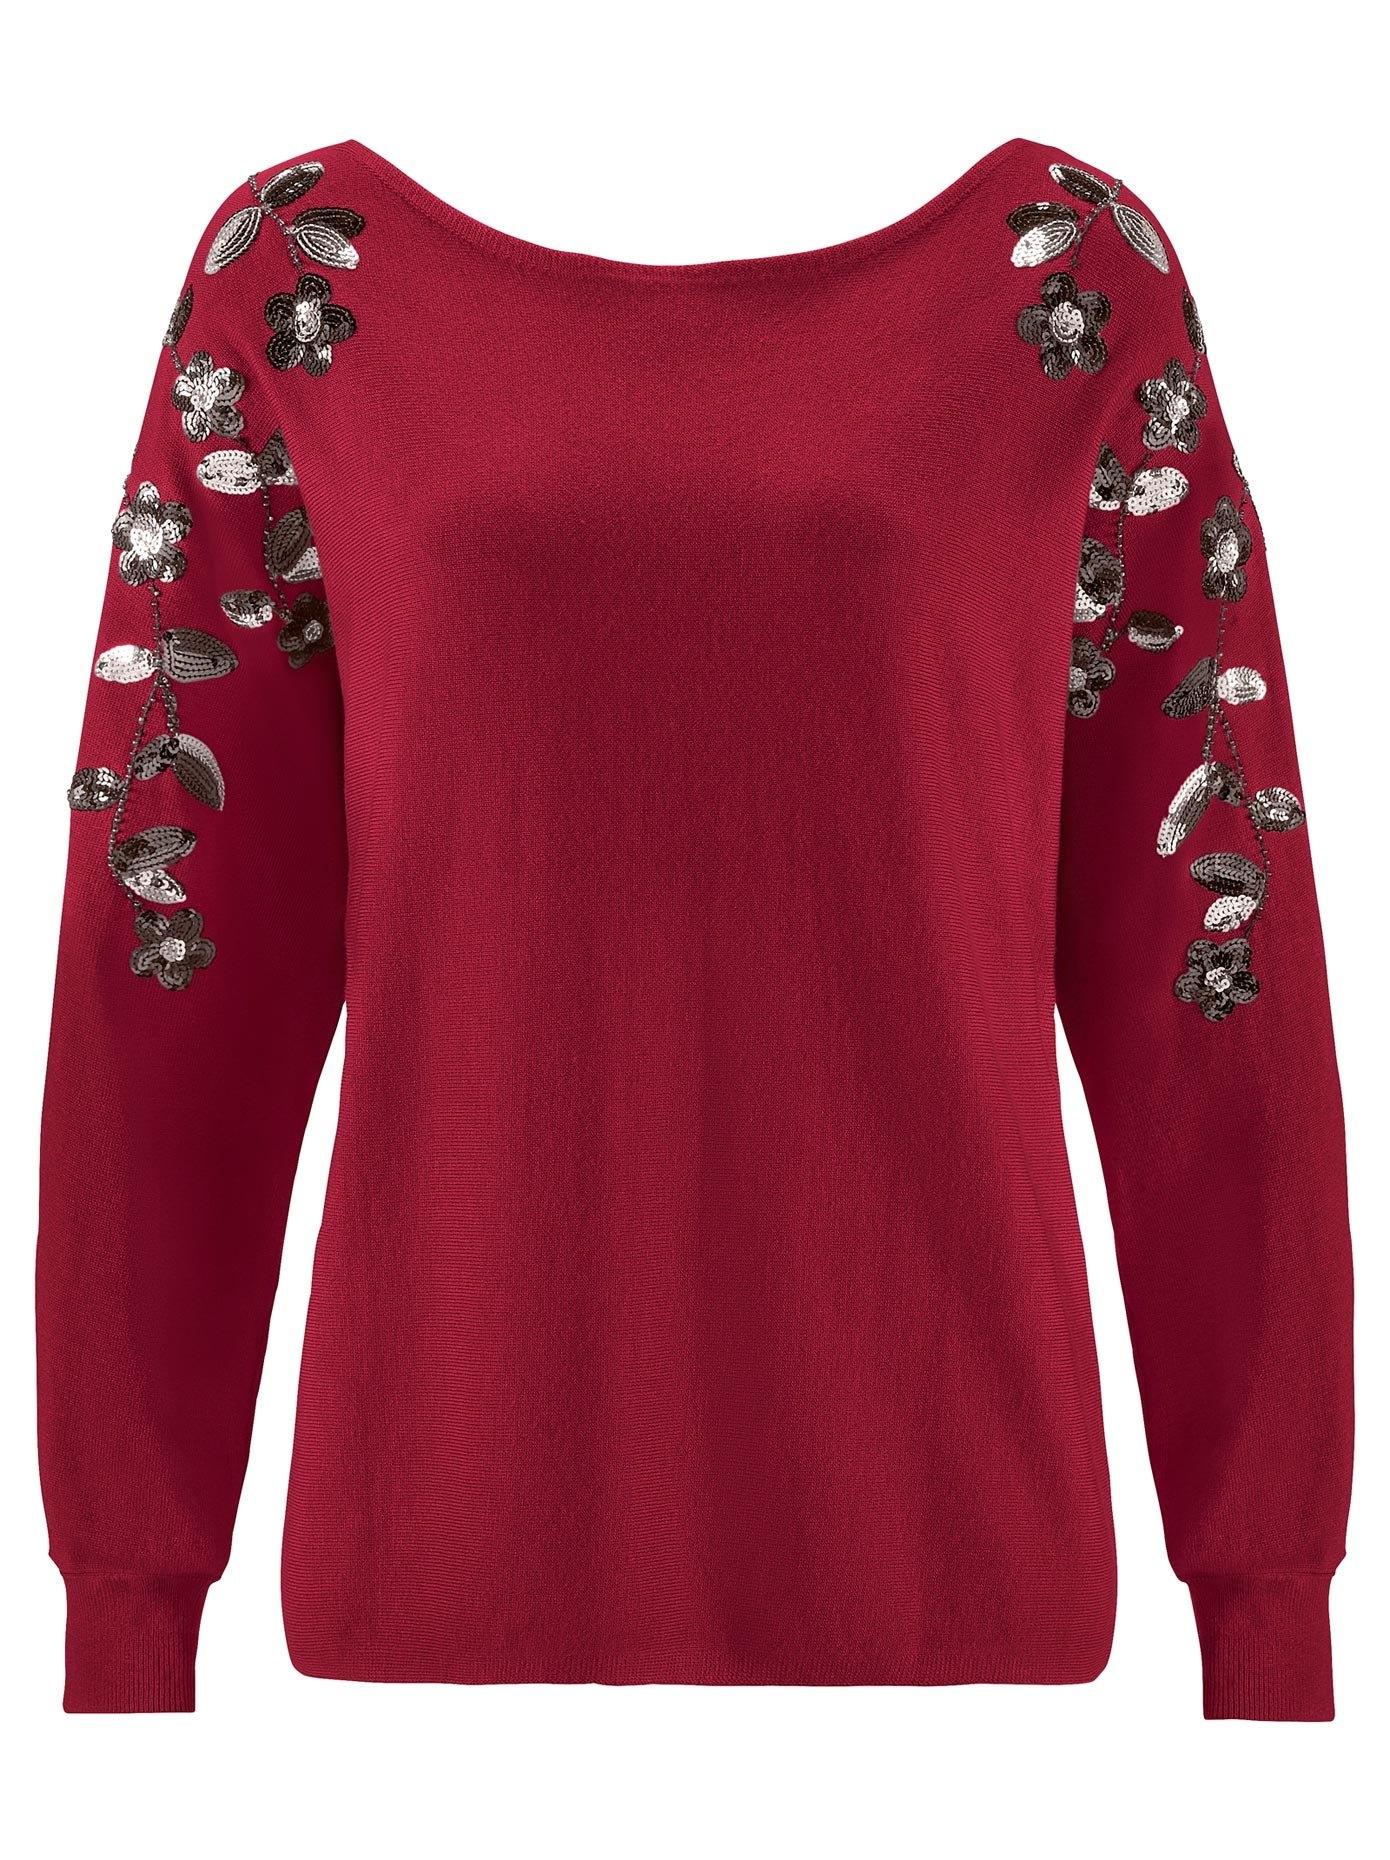 Lady gebreide trui online kopen op otto.nl